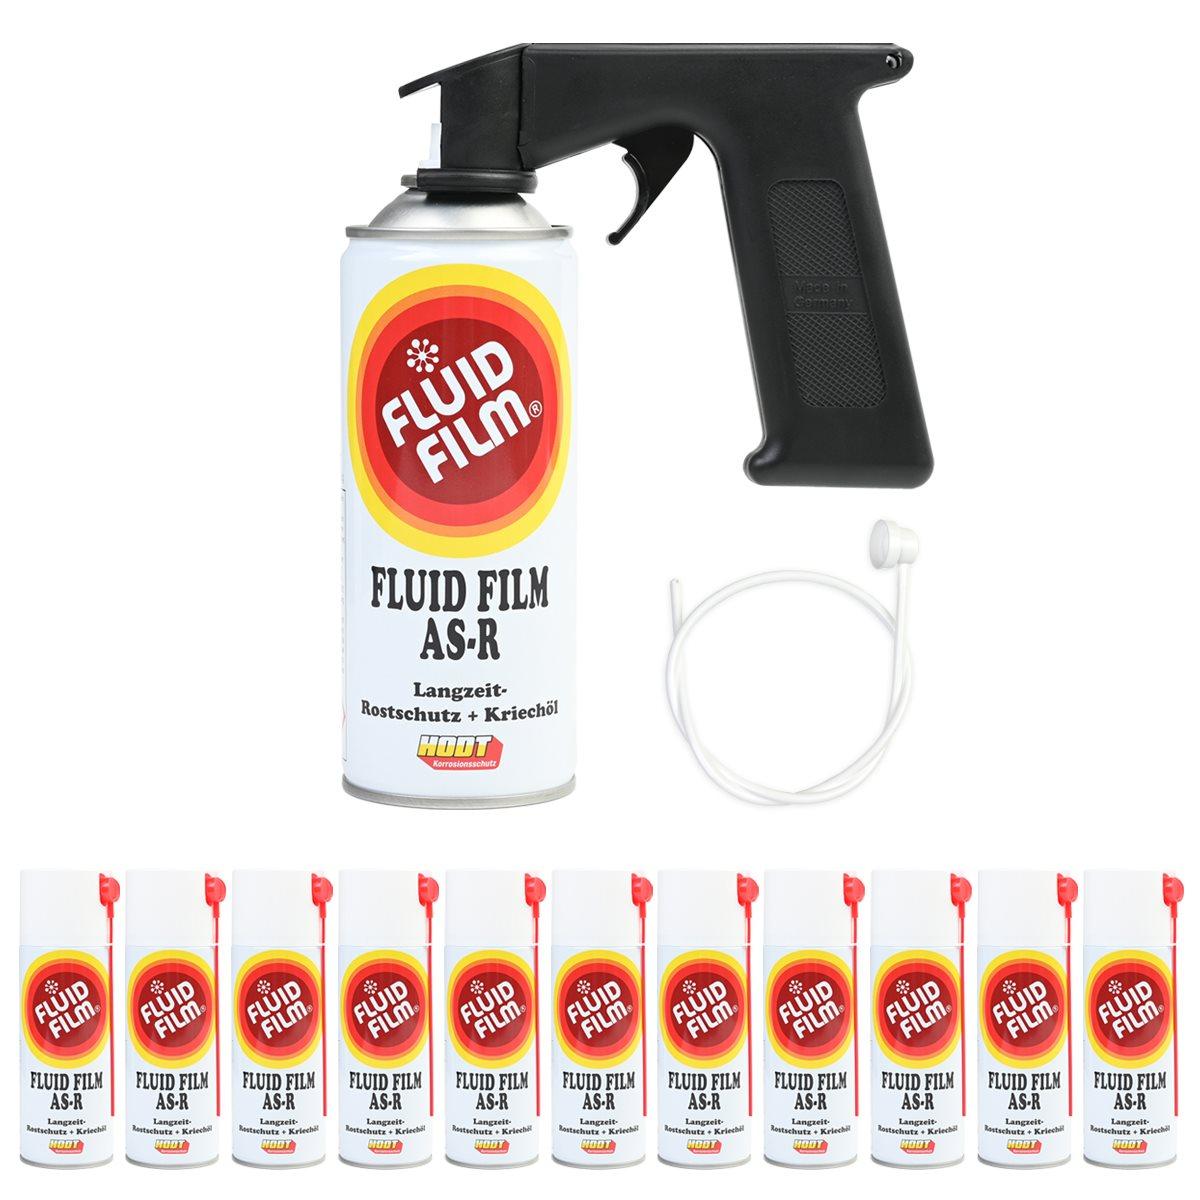 fluid film as r korrosionsschutz kriech l 400 ml 12er set sonde handgriff ebay. Black Bedroom Furniture Sets. Home Design Ideas